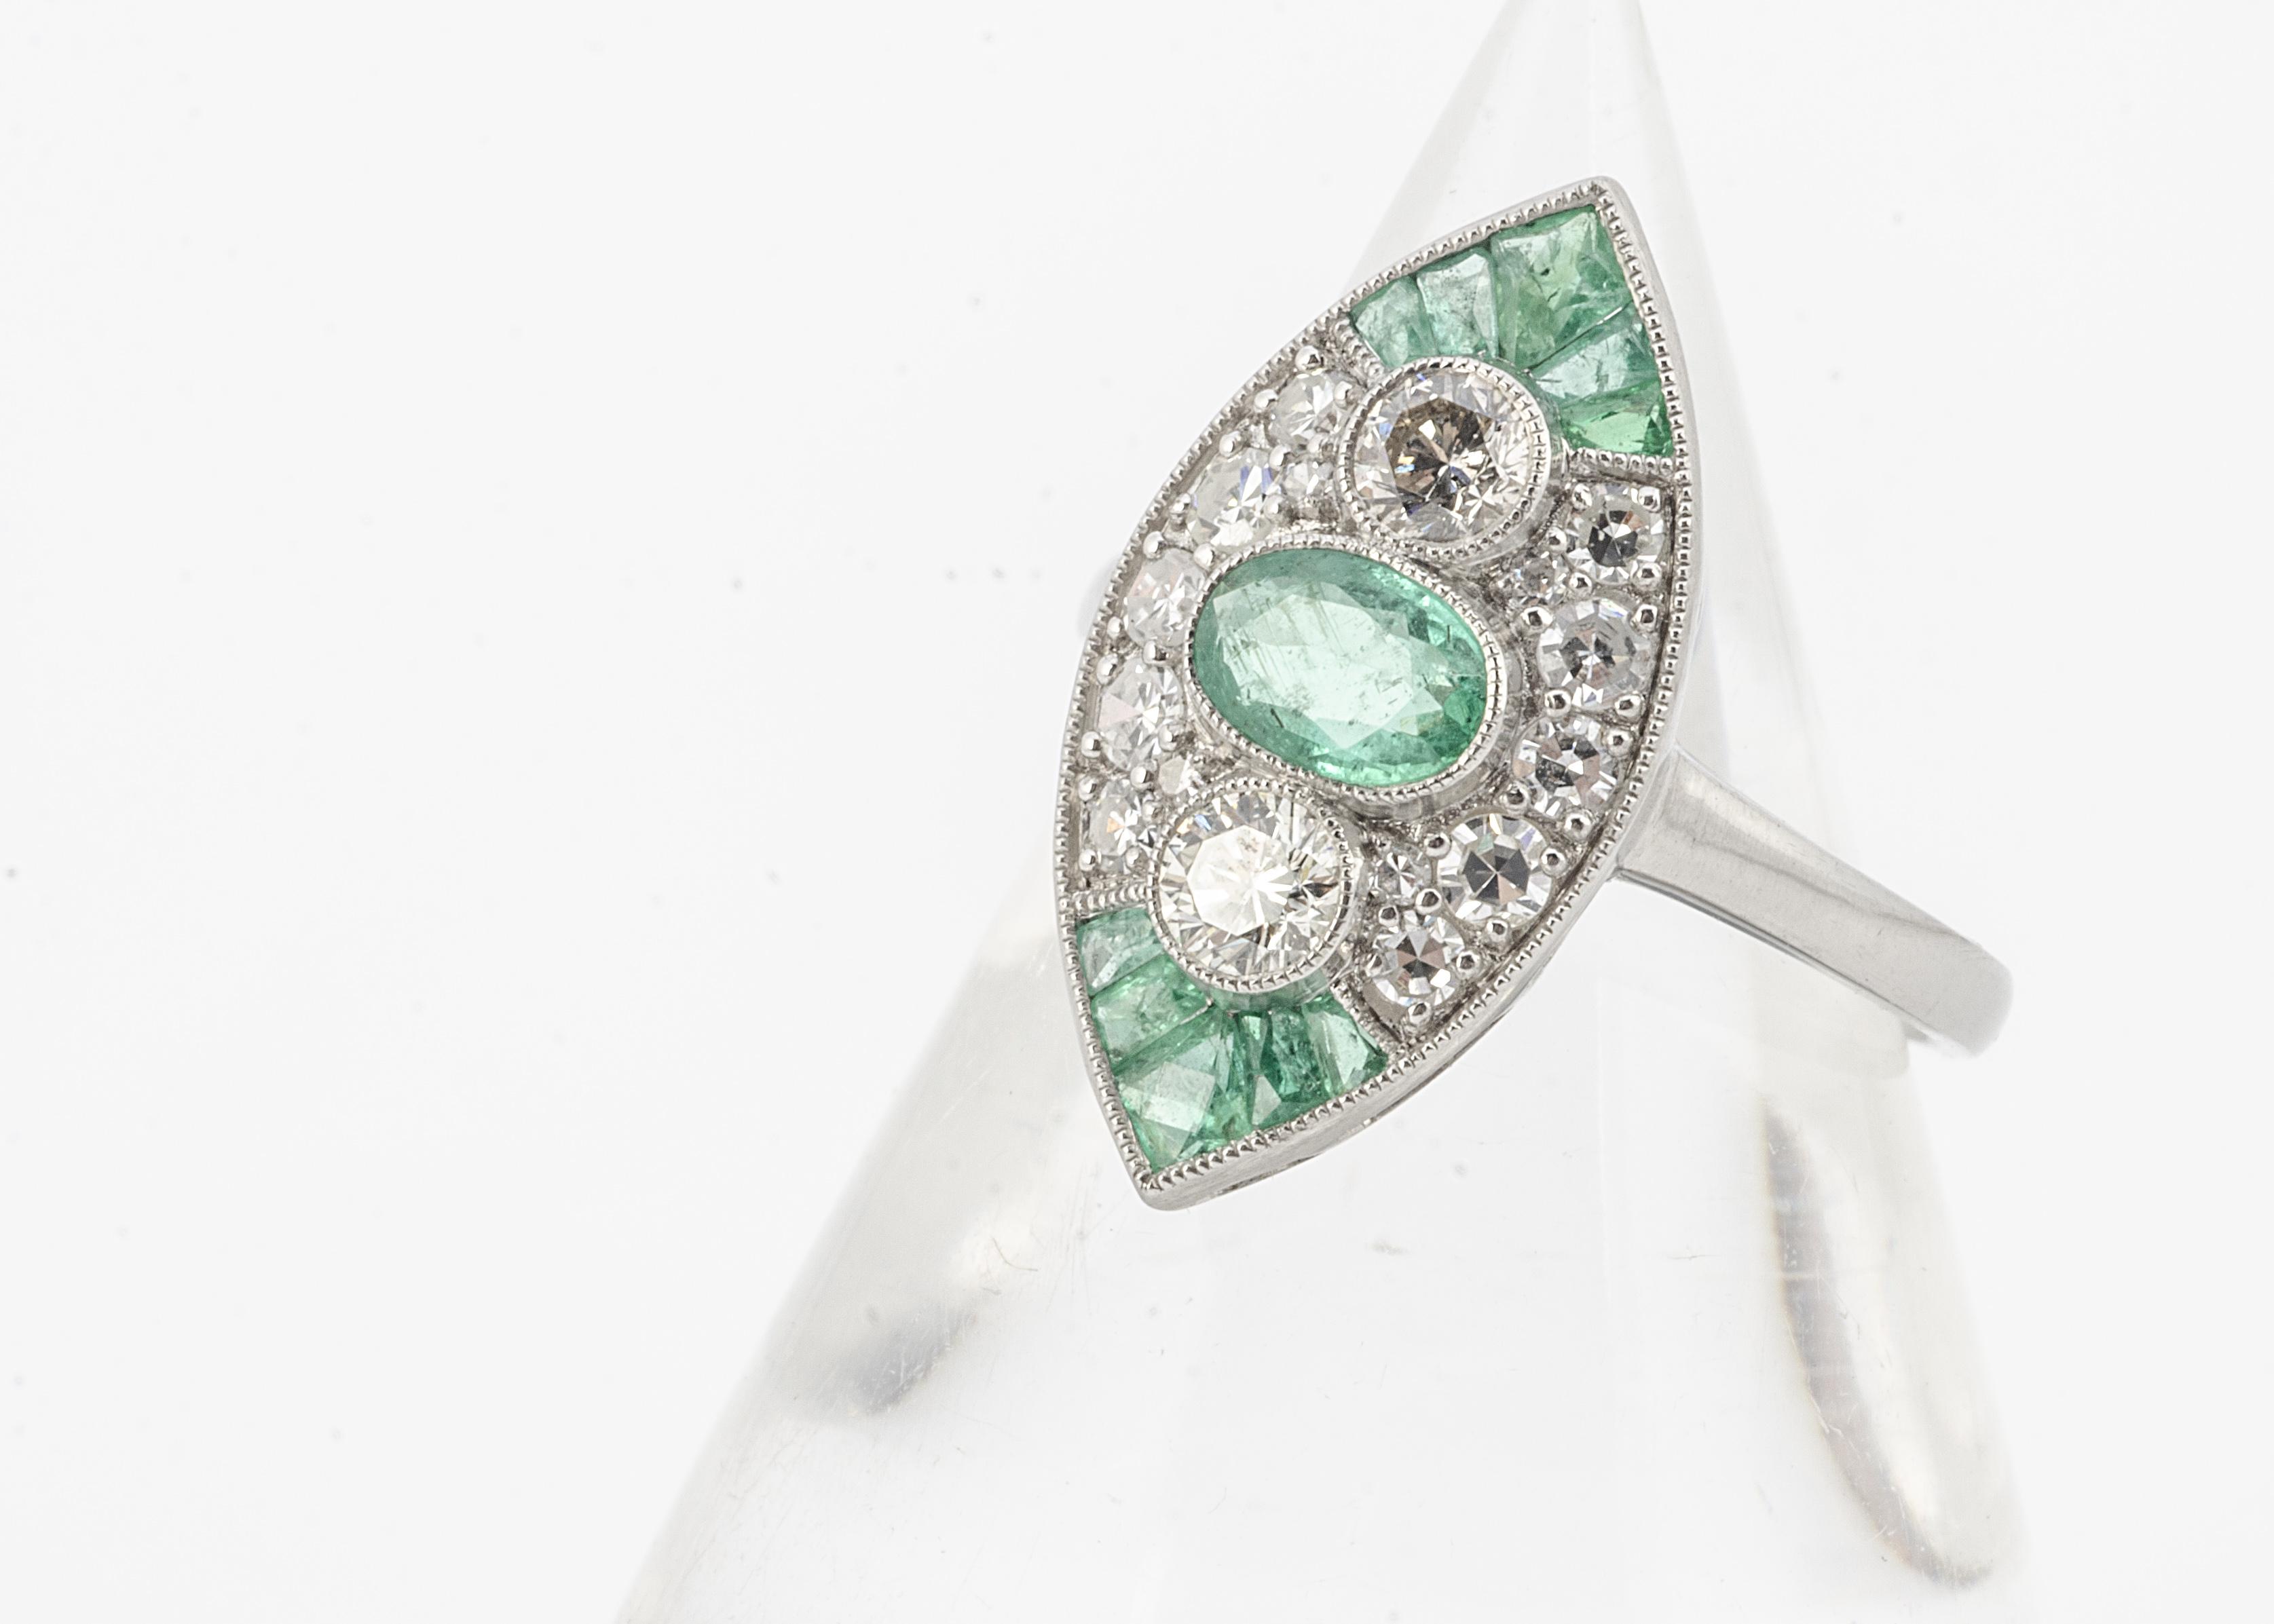 An Edwardian style platinum set emerald and diamond navette shaped ring, emeralds 0.75ct, diamonds